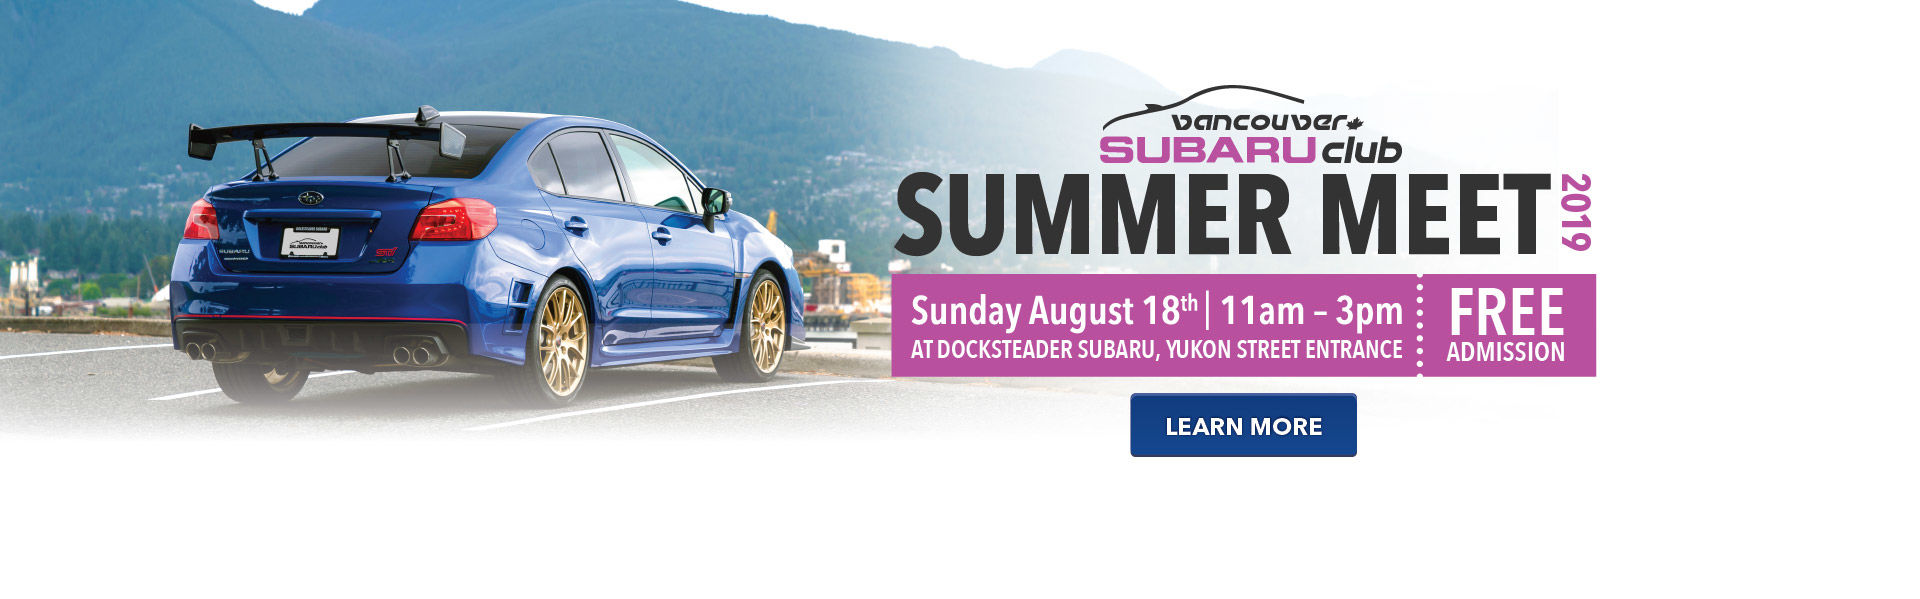 Subaru Summer Meet 2019